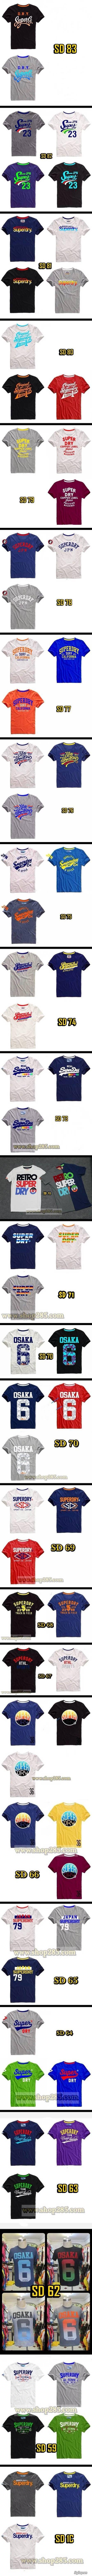 Quần kaki ZARA SlimFit,quần jean Levi's 511 SlimFit,quần short SuperDry,short jean CK - 23